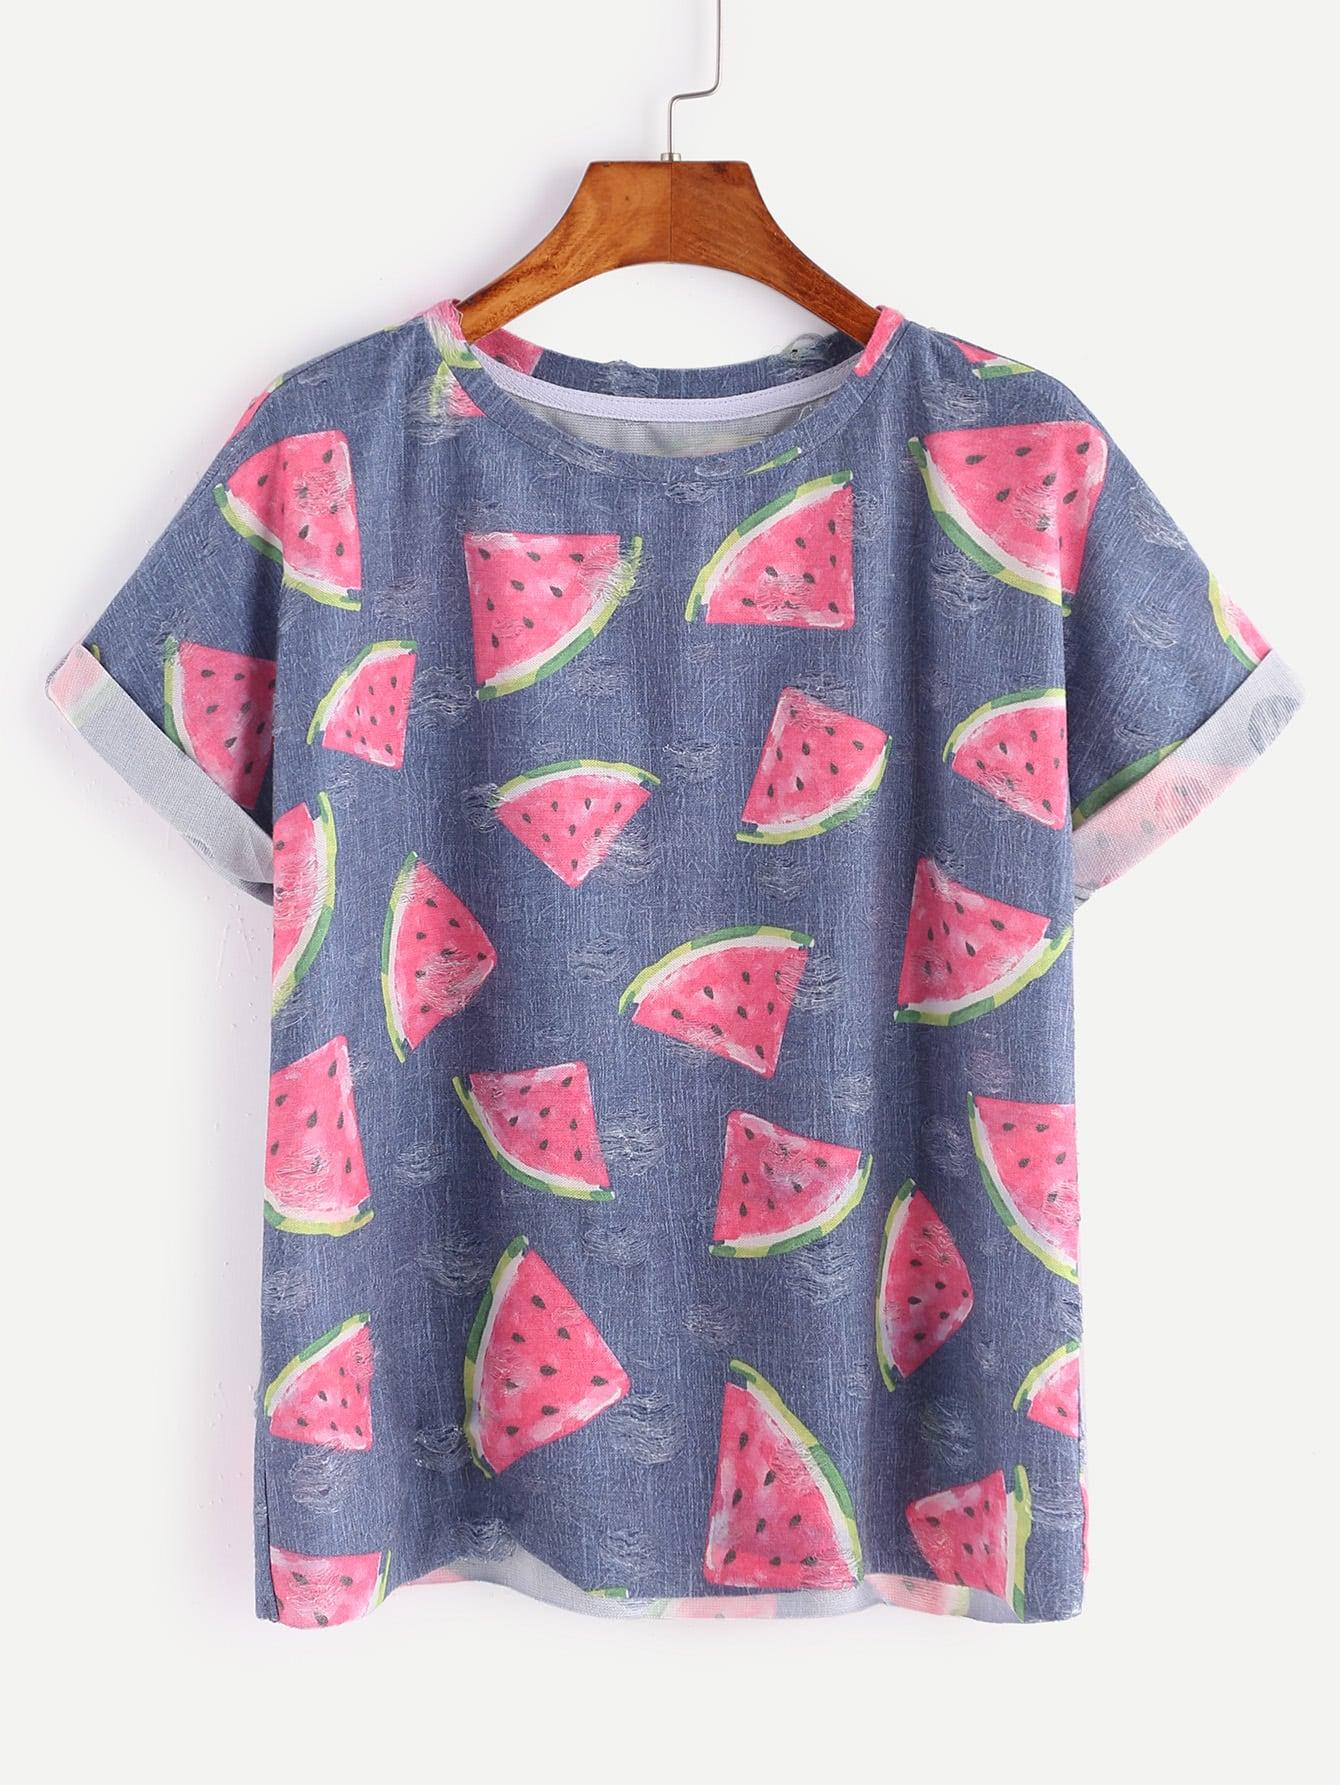 Allover Watermelon Print Frayed Dot Cuffed Tee graphic print cuffed tee